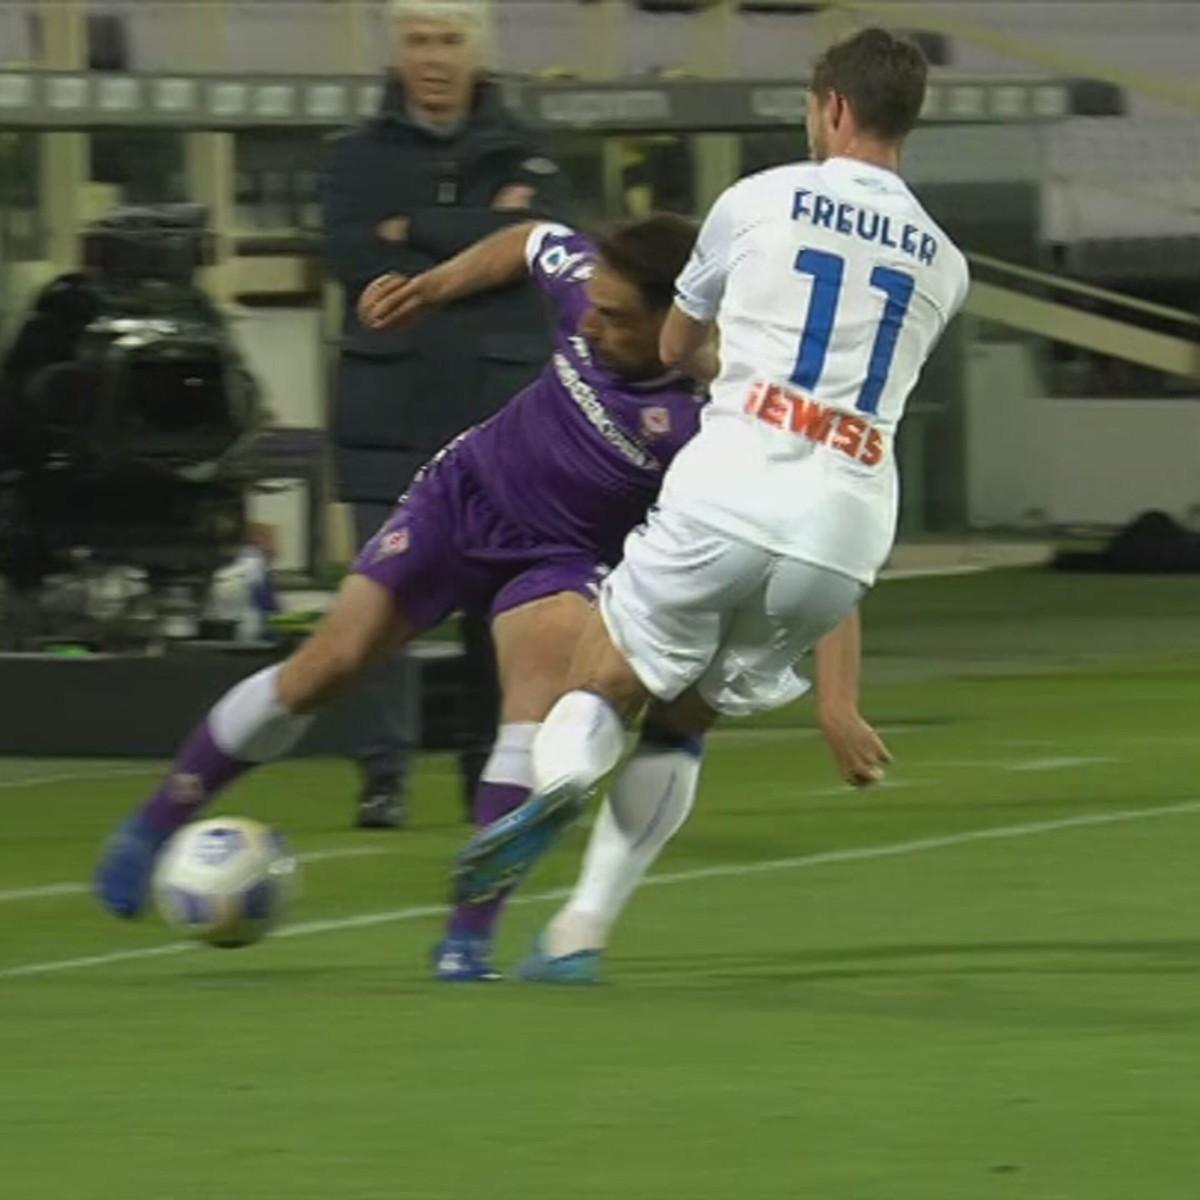 Serie A, Fiorentina-Atalanta 2-3: gli highlights